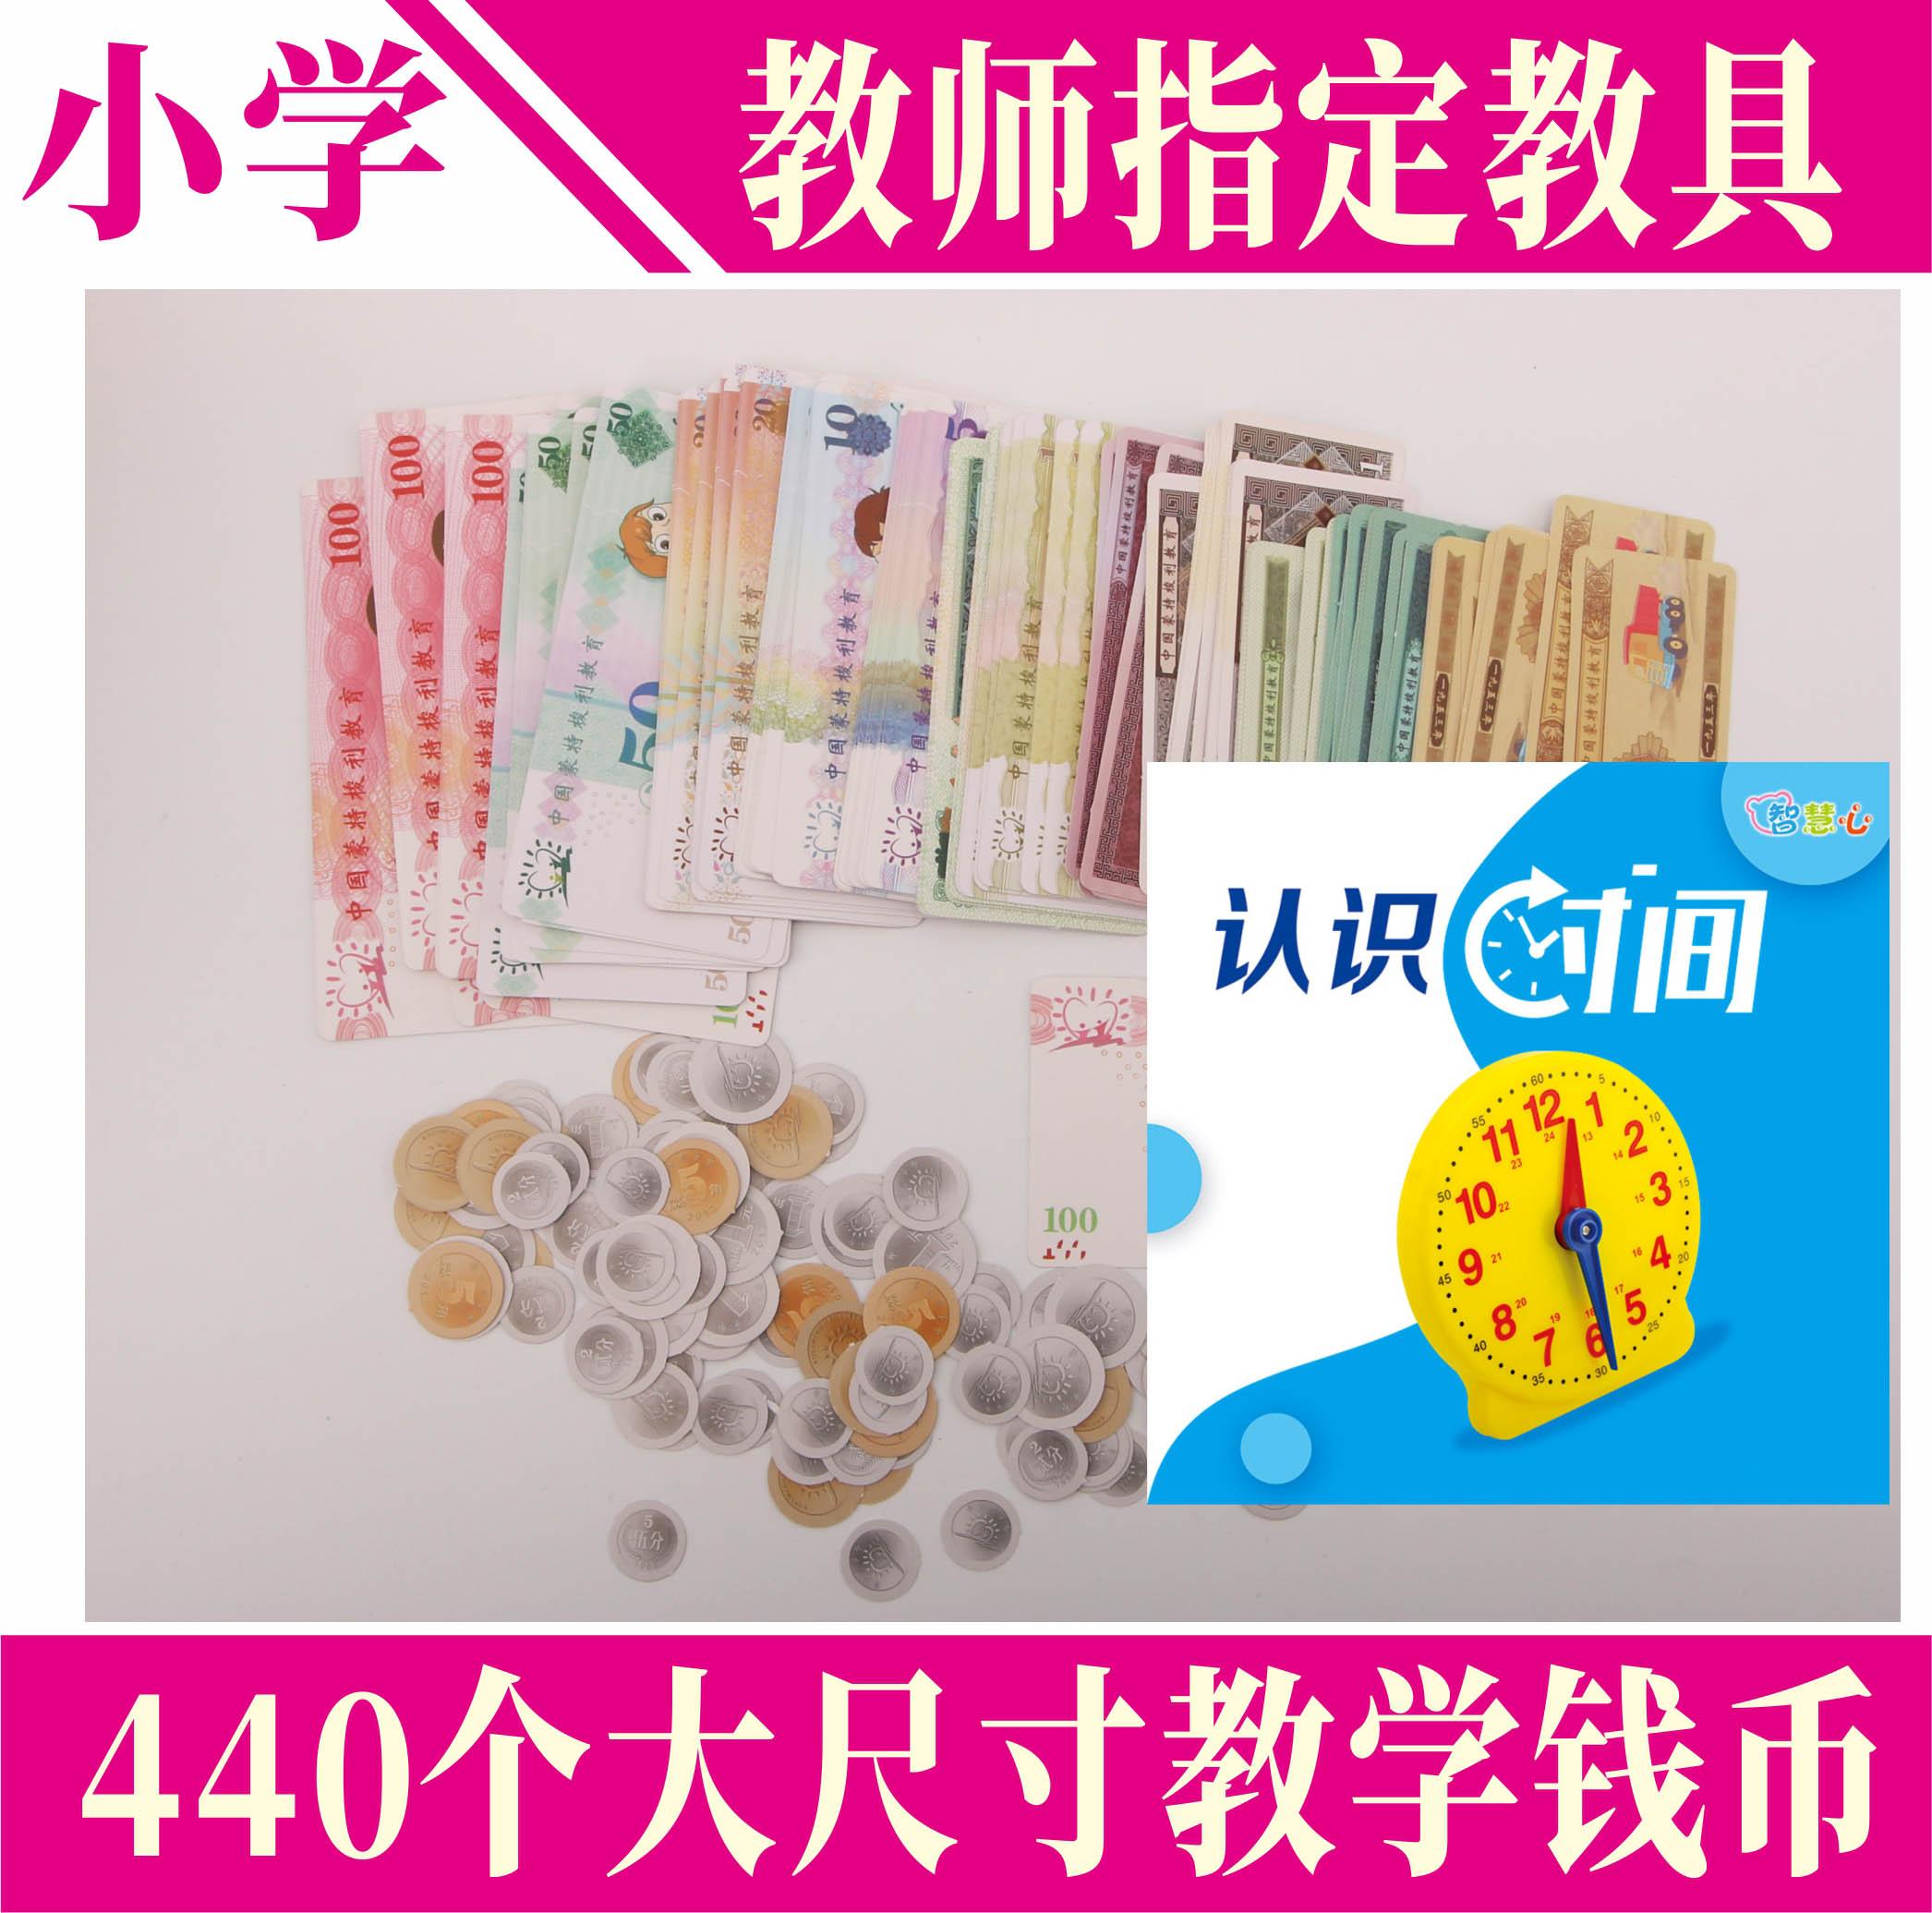 Китайские деньги Артикул 641770656932